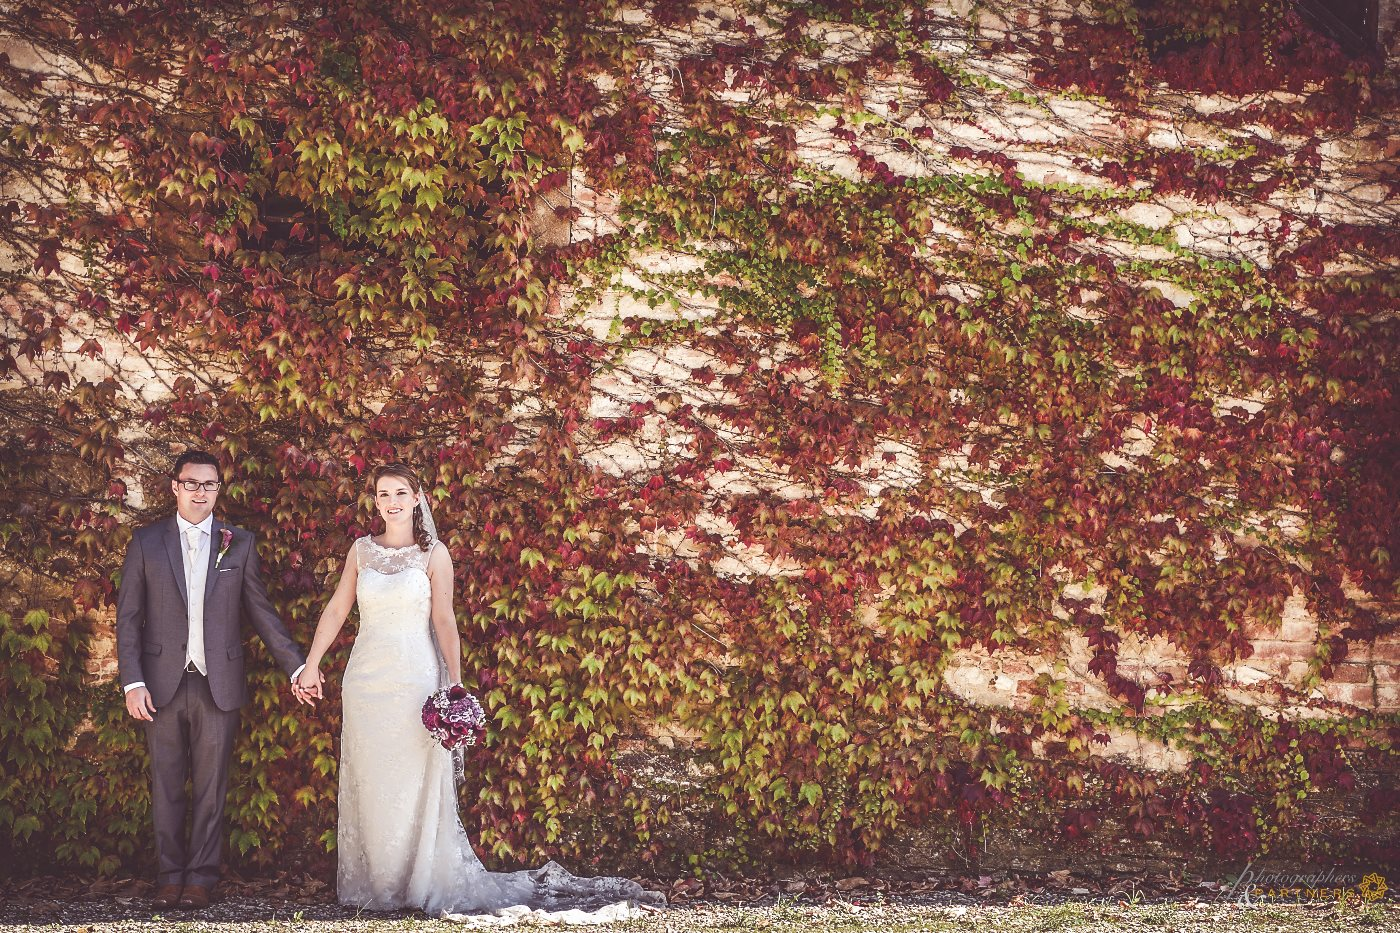 wedding_photos_sticciano_16.jpg